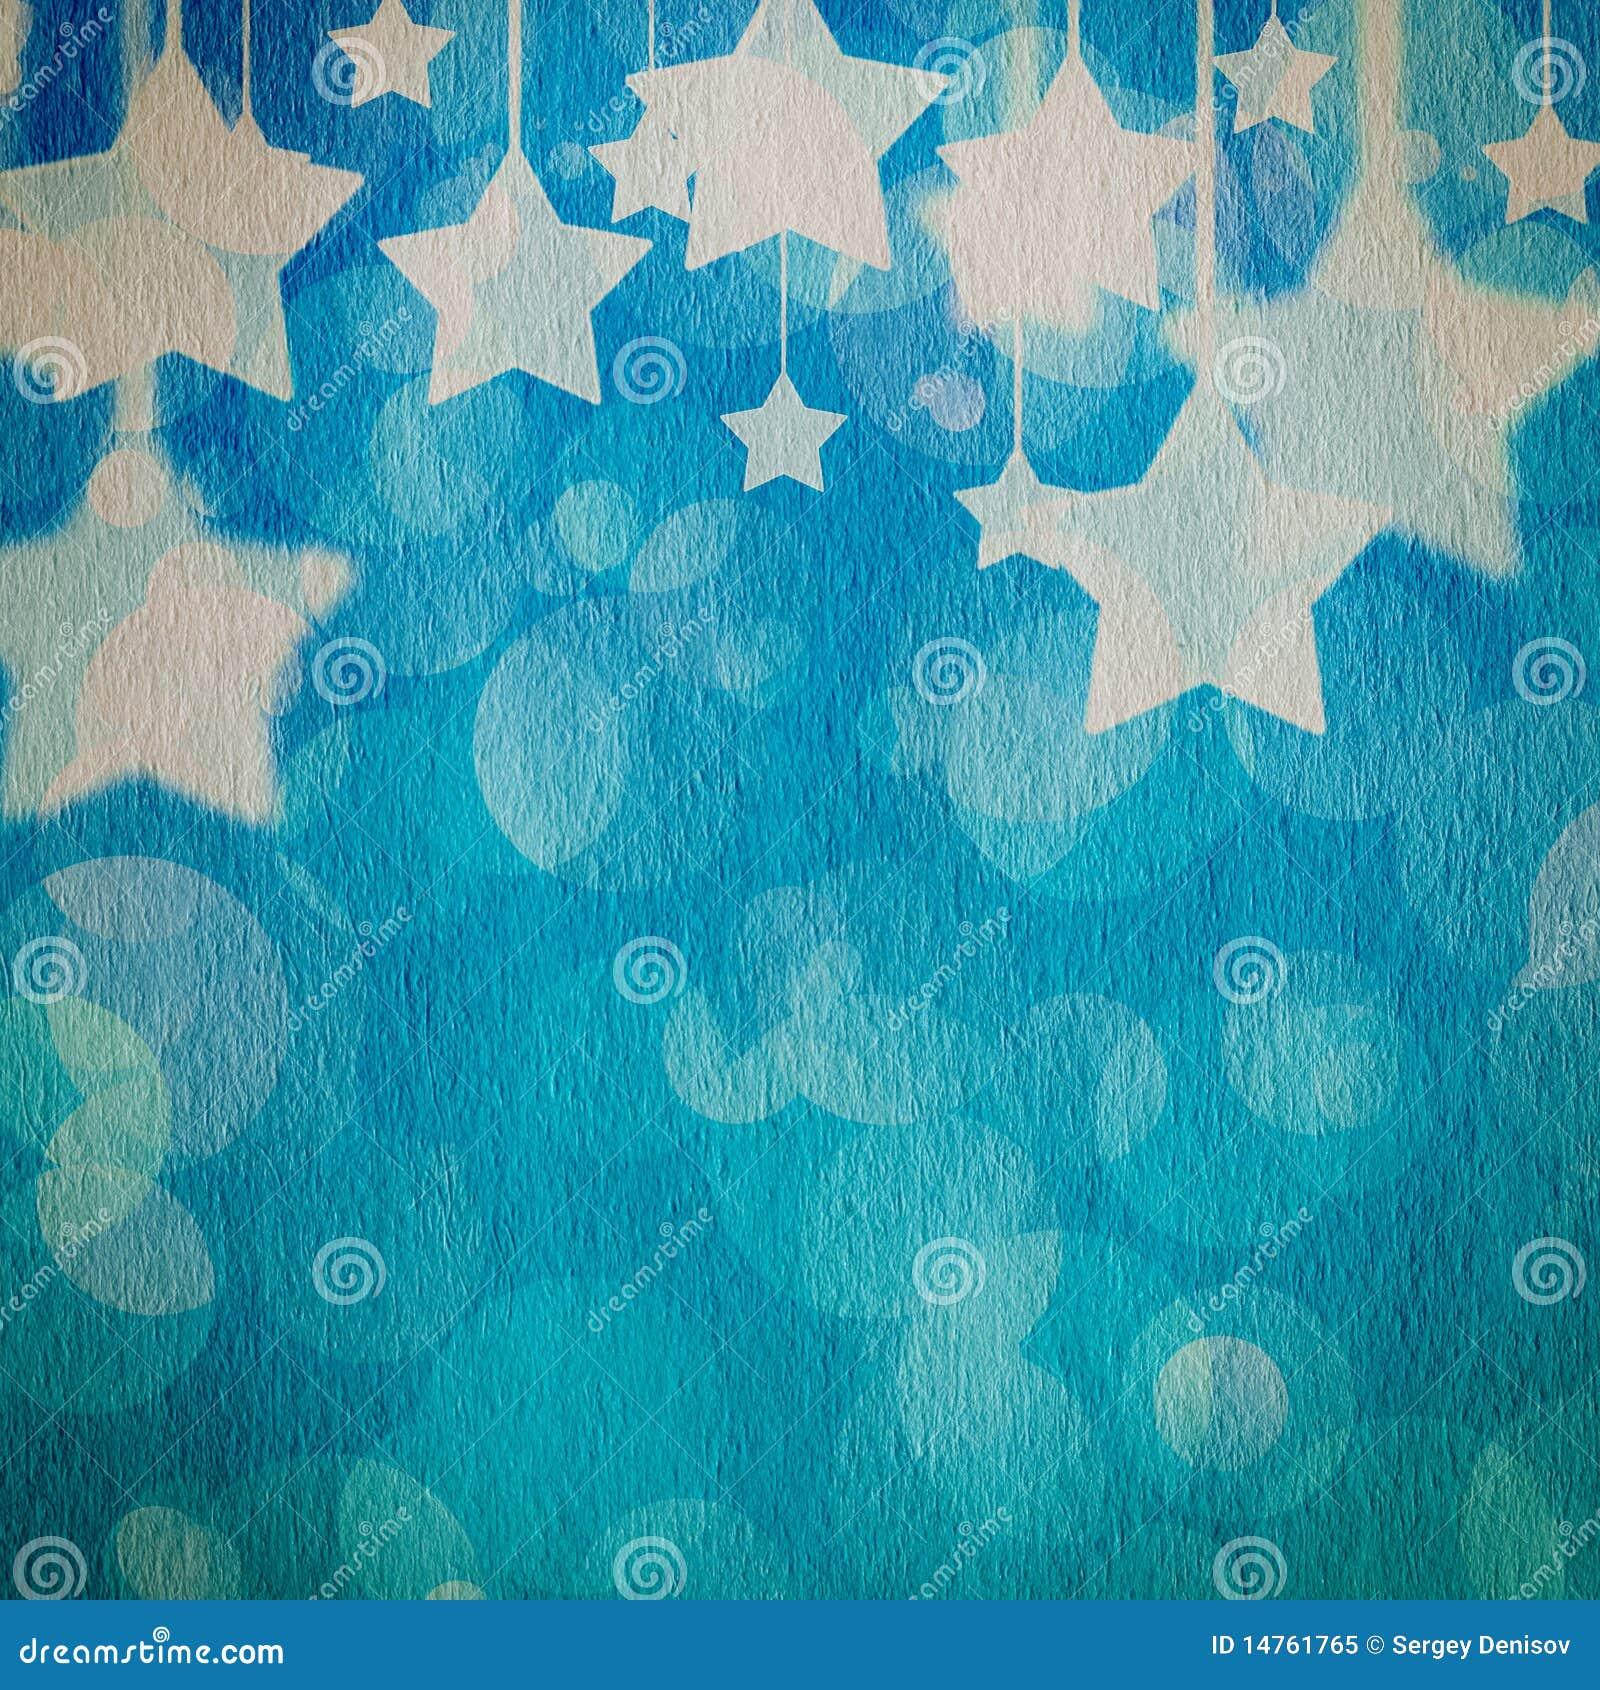 Stars on the grunge paper